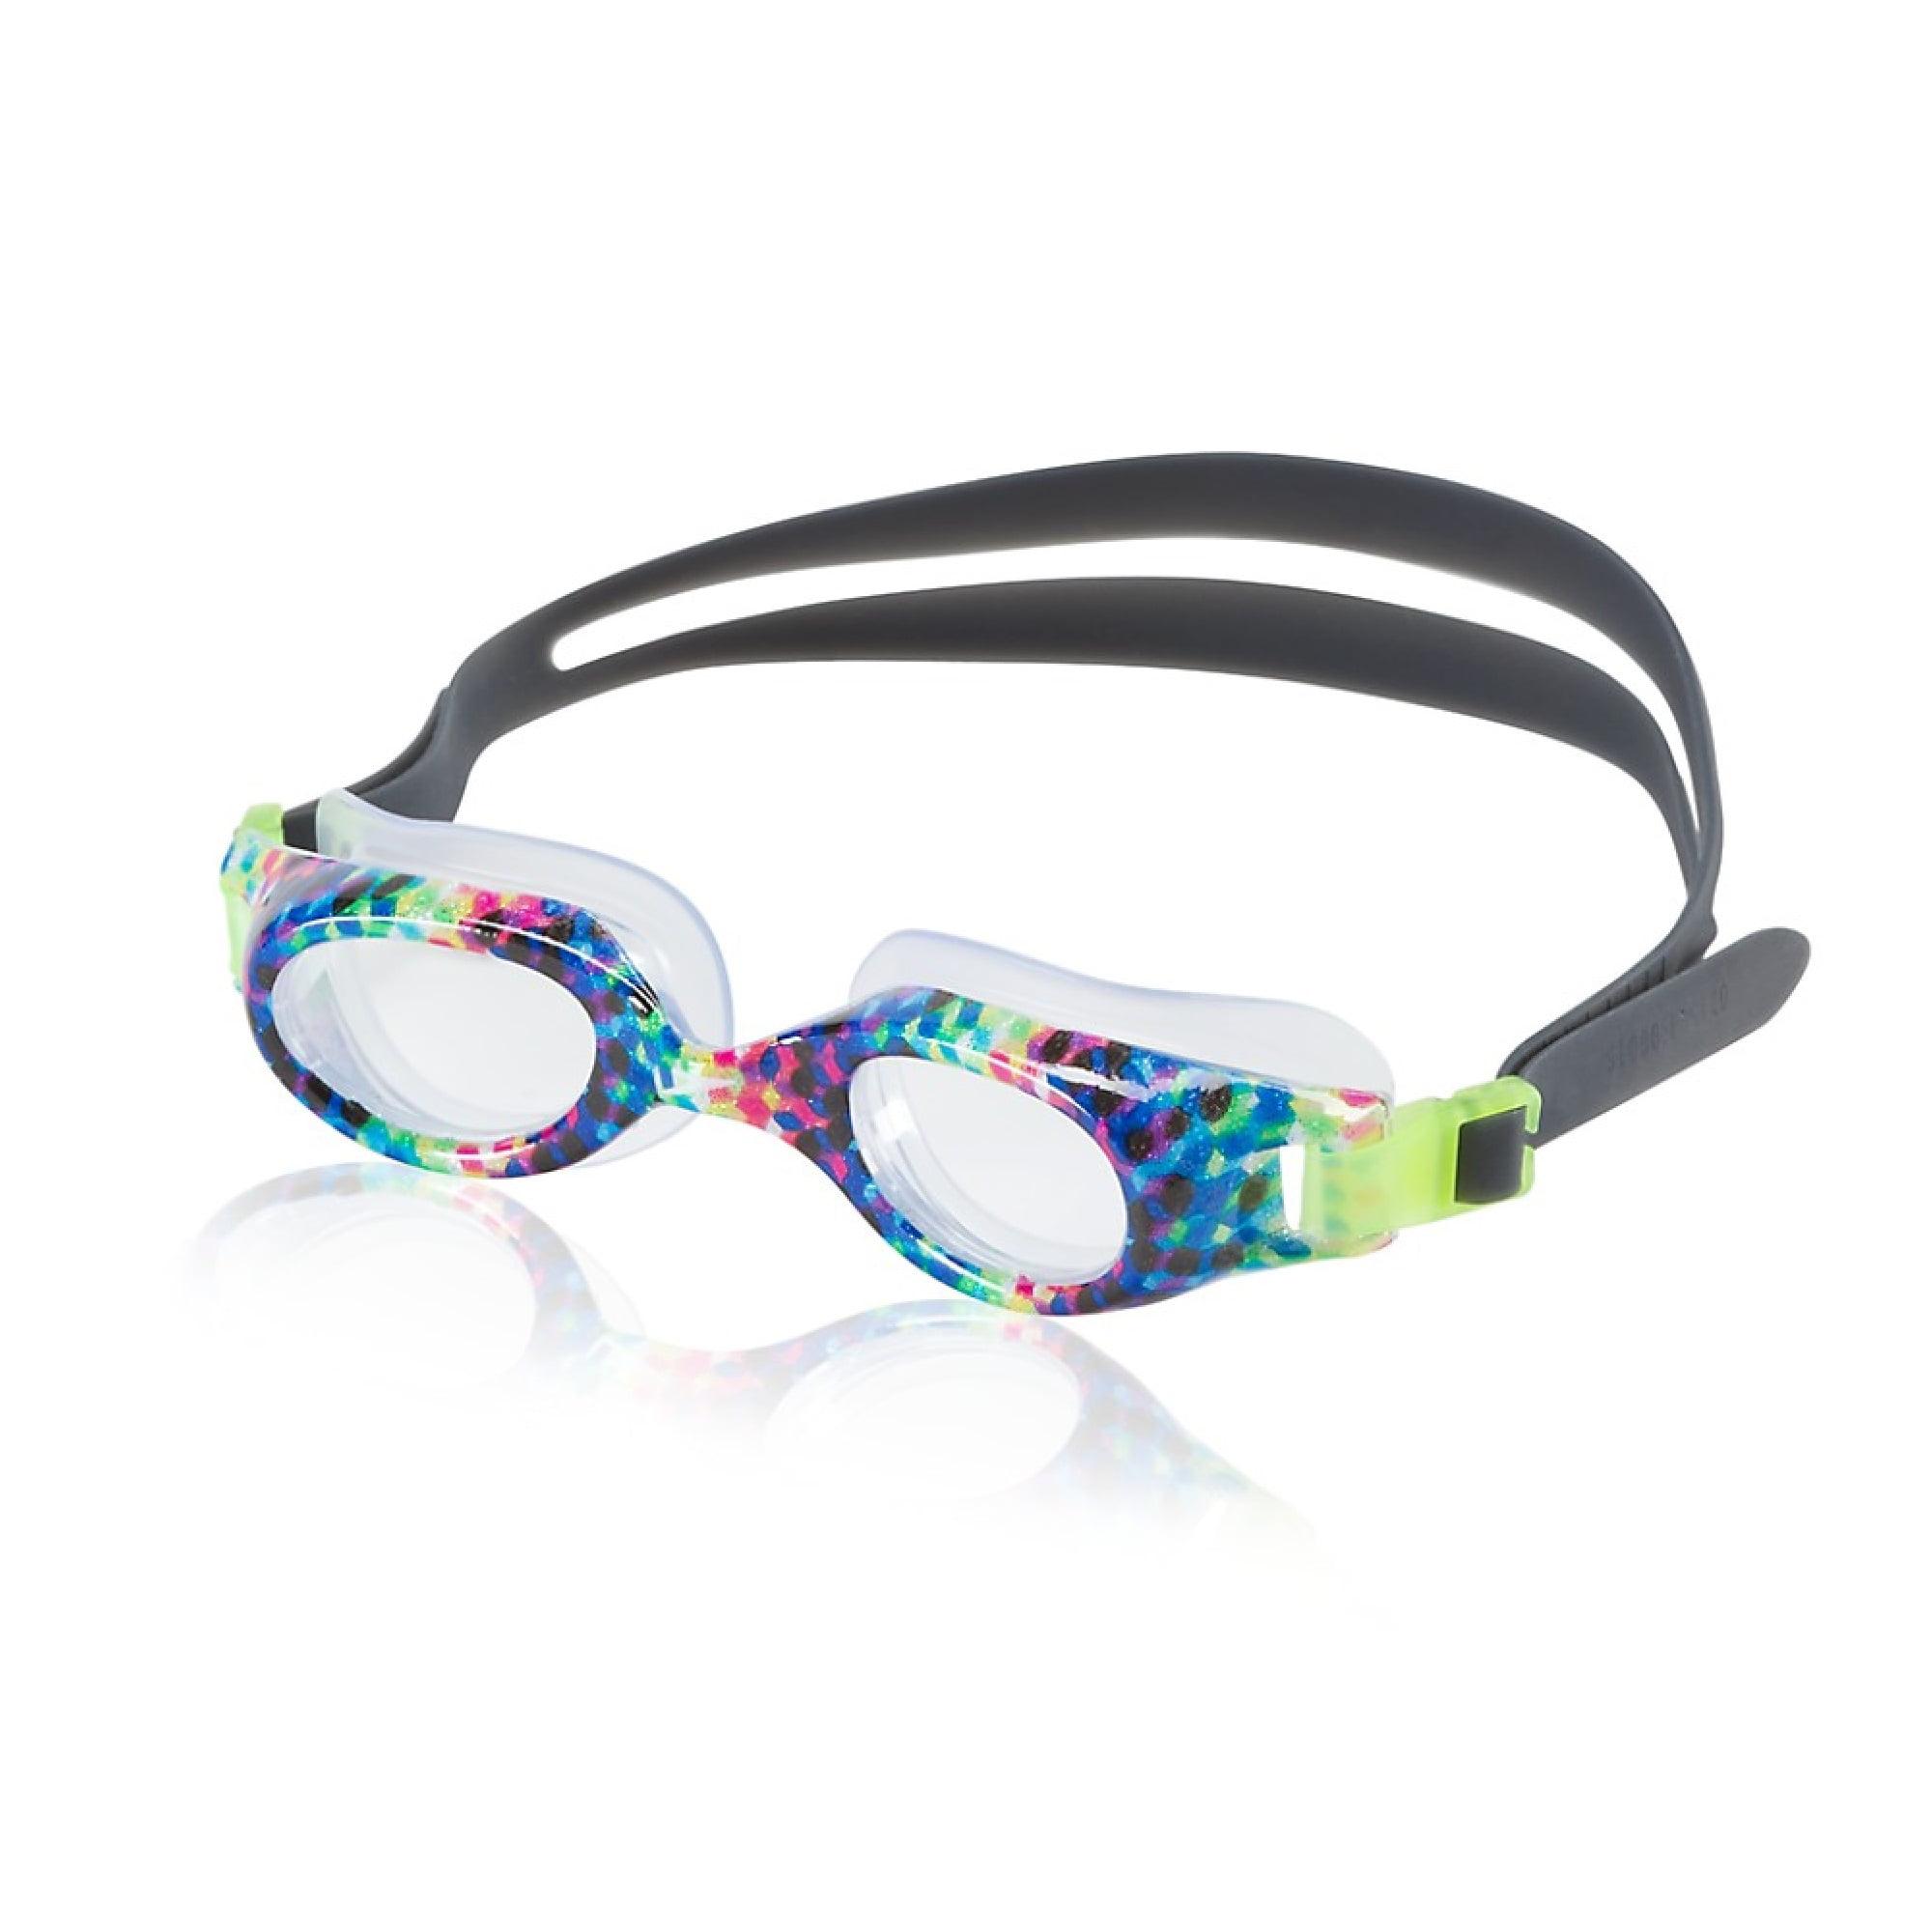 Speedo Junior Hydrospex Print Goggle - Kids Recreation Goggle - Rainbow